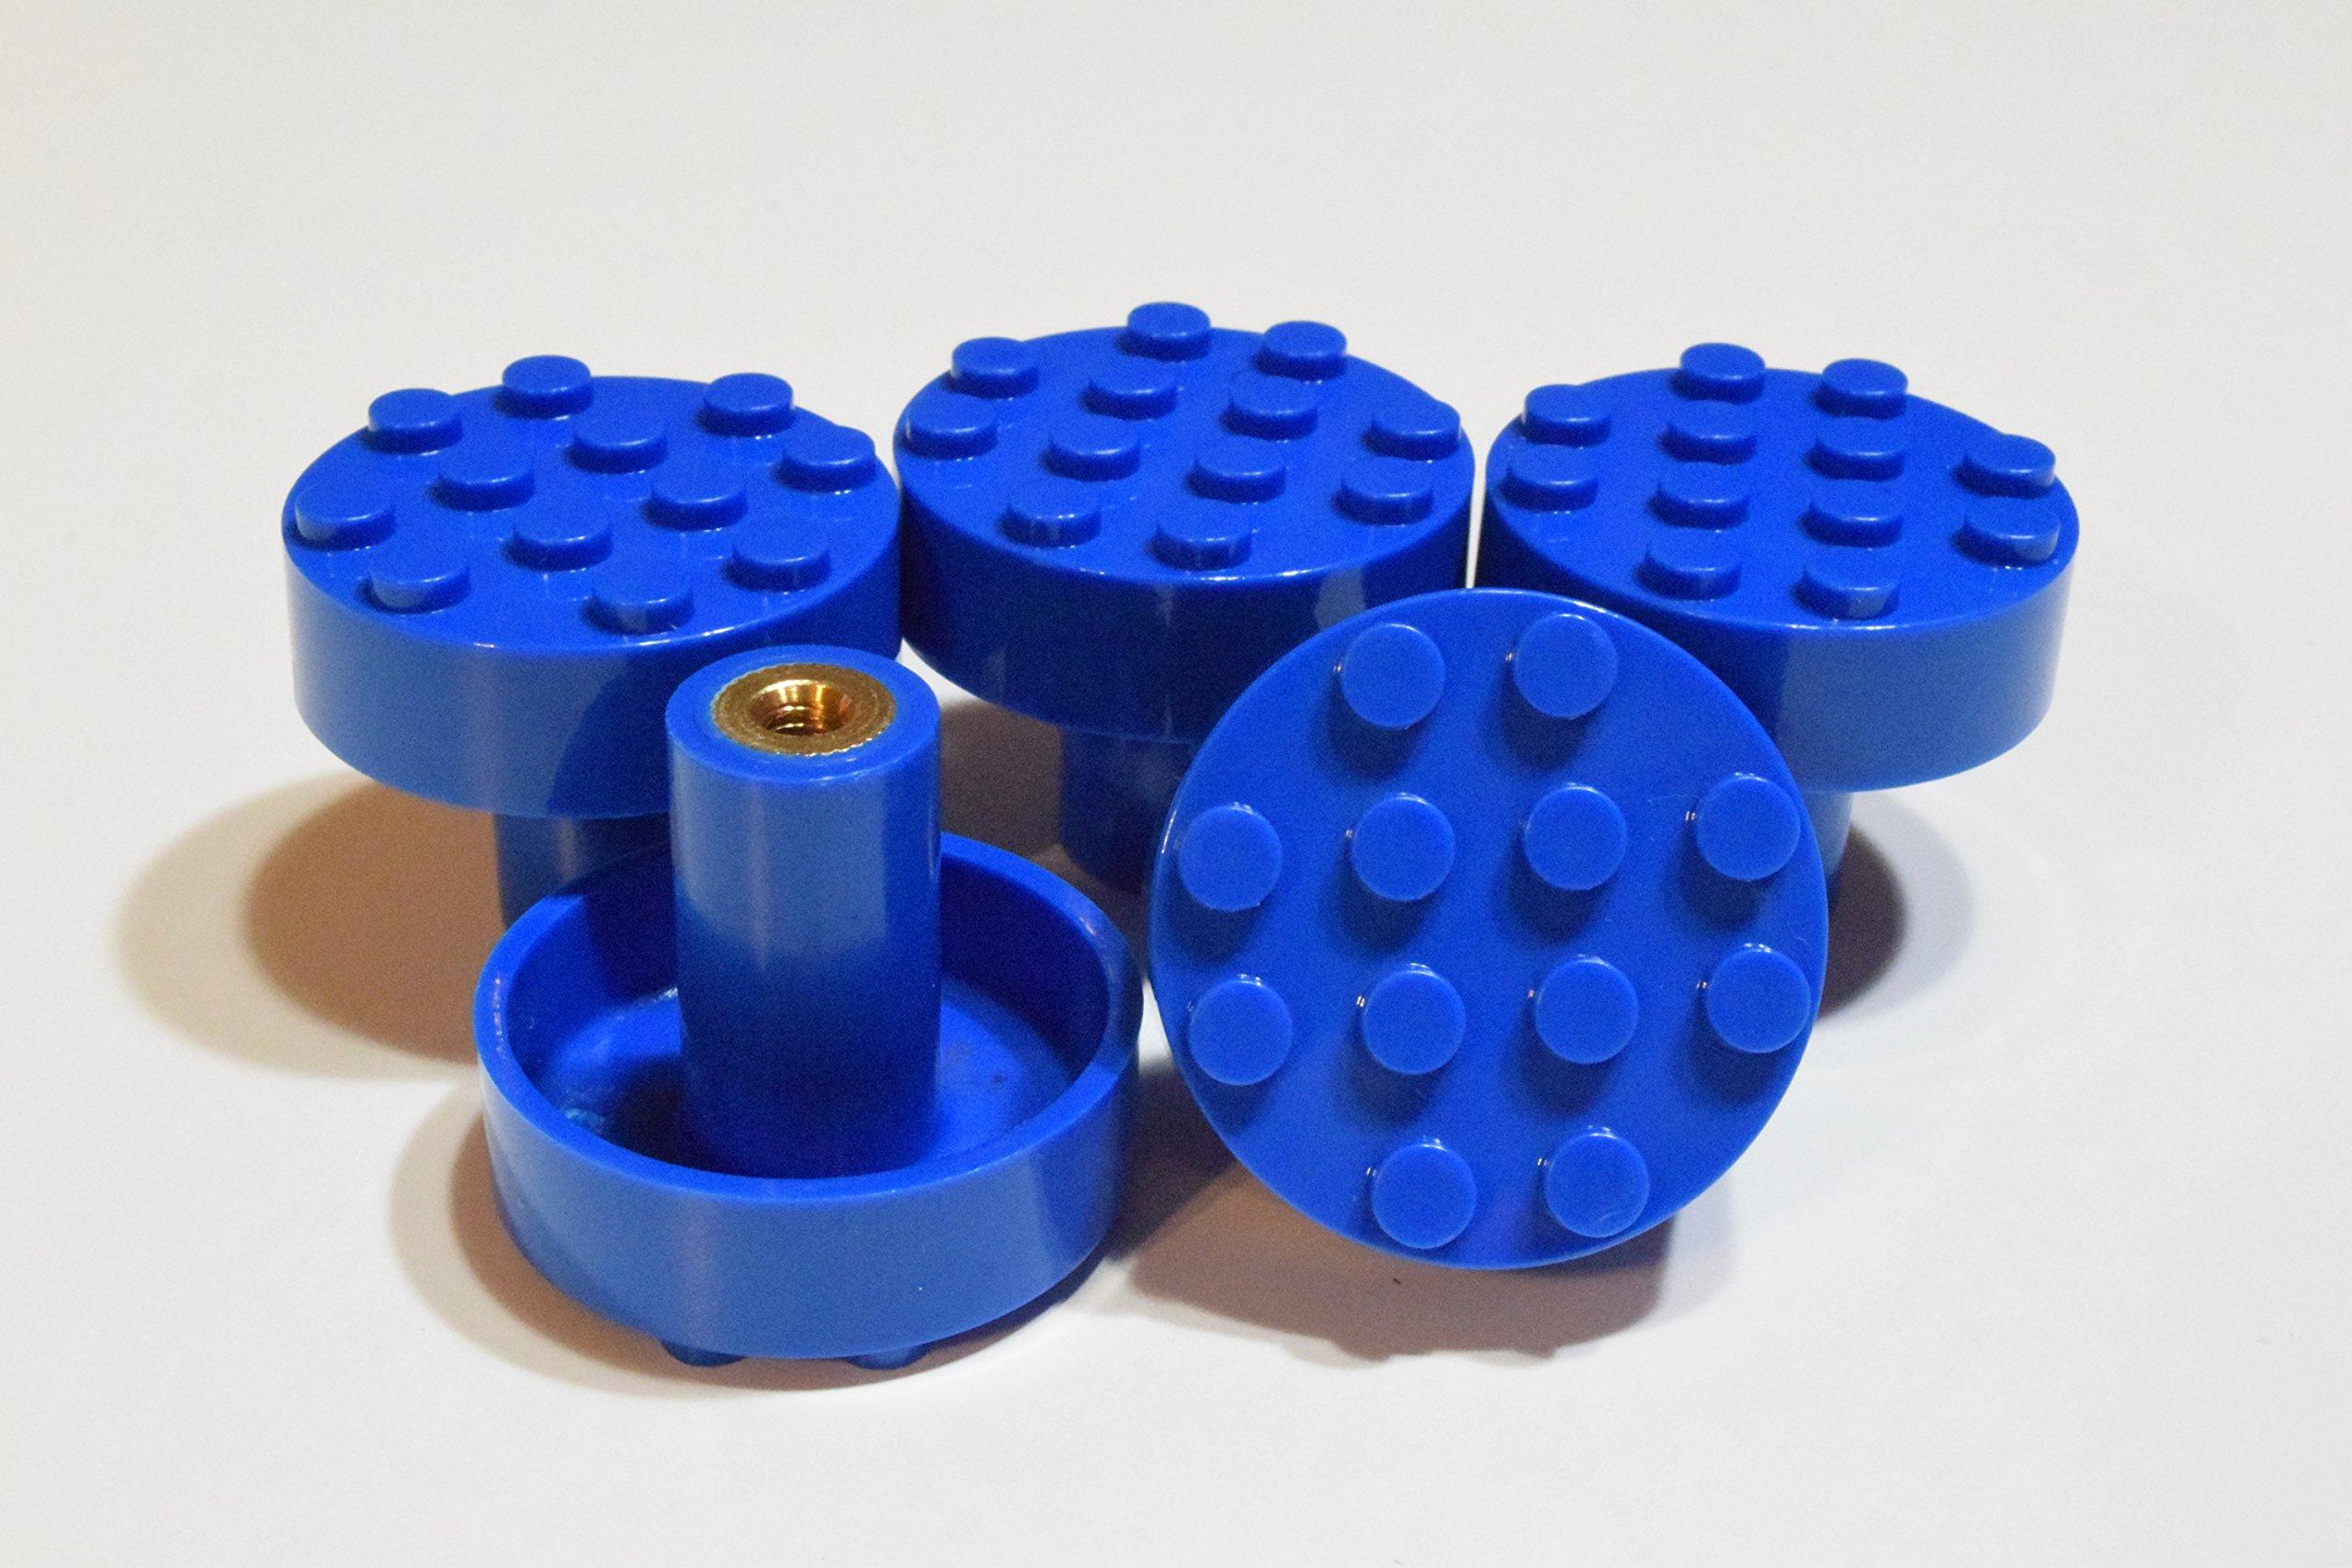 Set of 5 Build-On Brick Knobs (Blue)